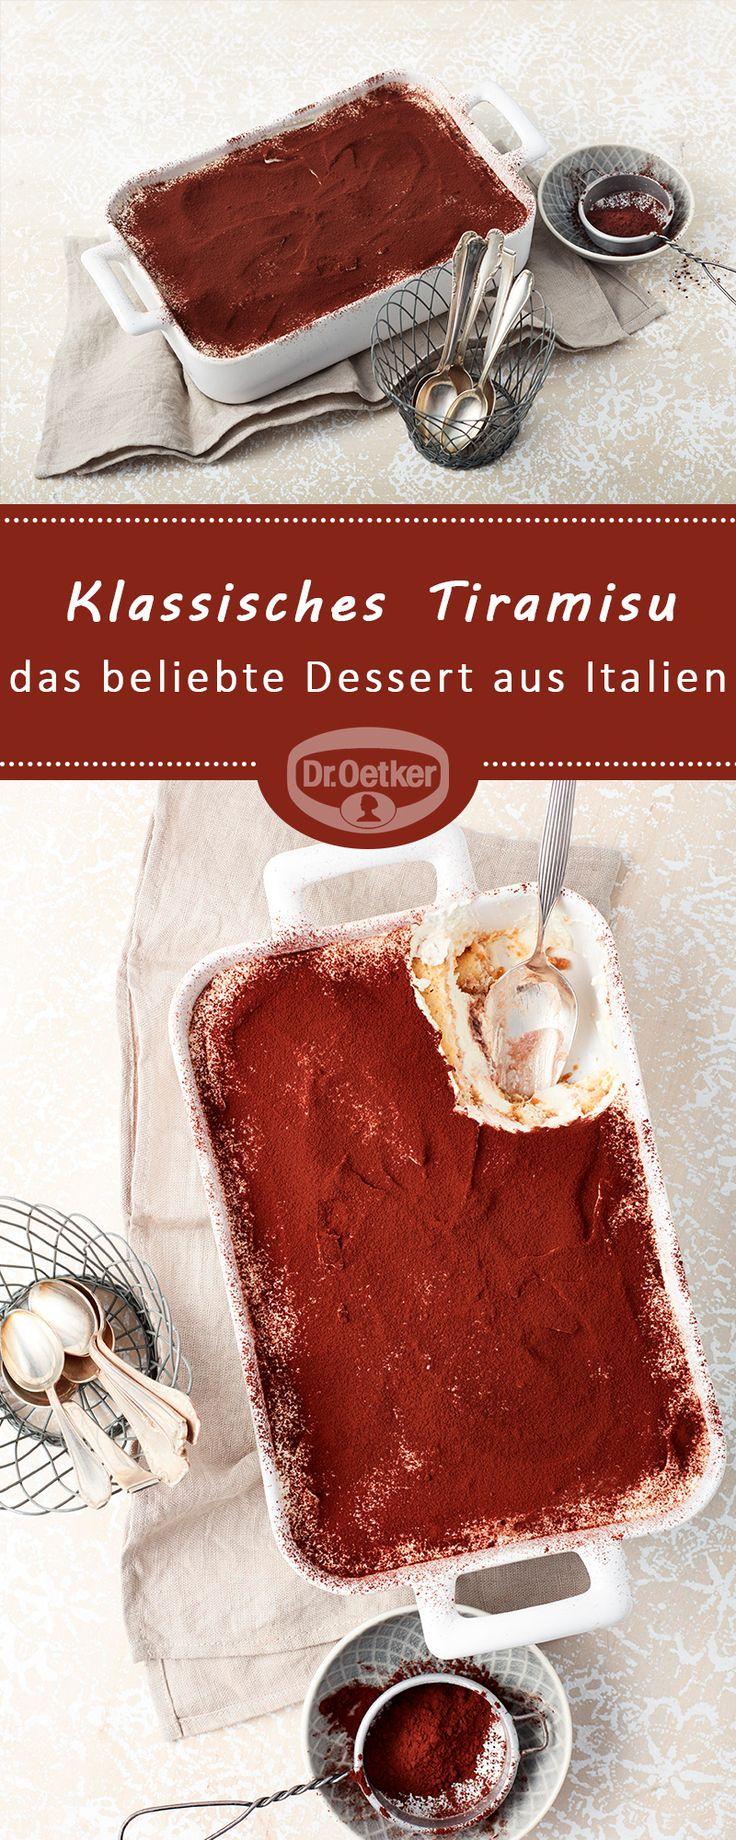 Tiramisu, klassisch – Dessert-Rezepte